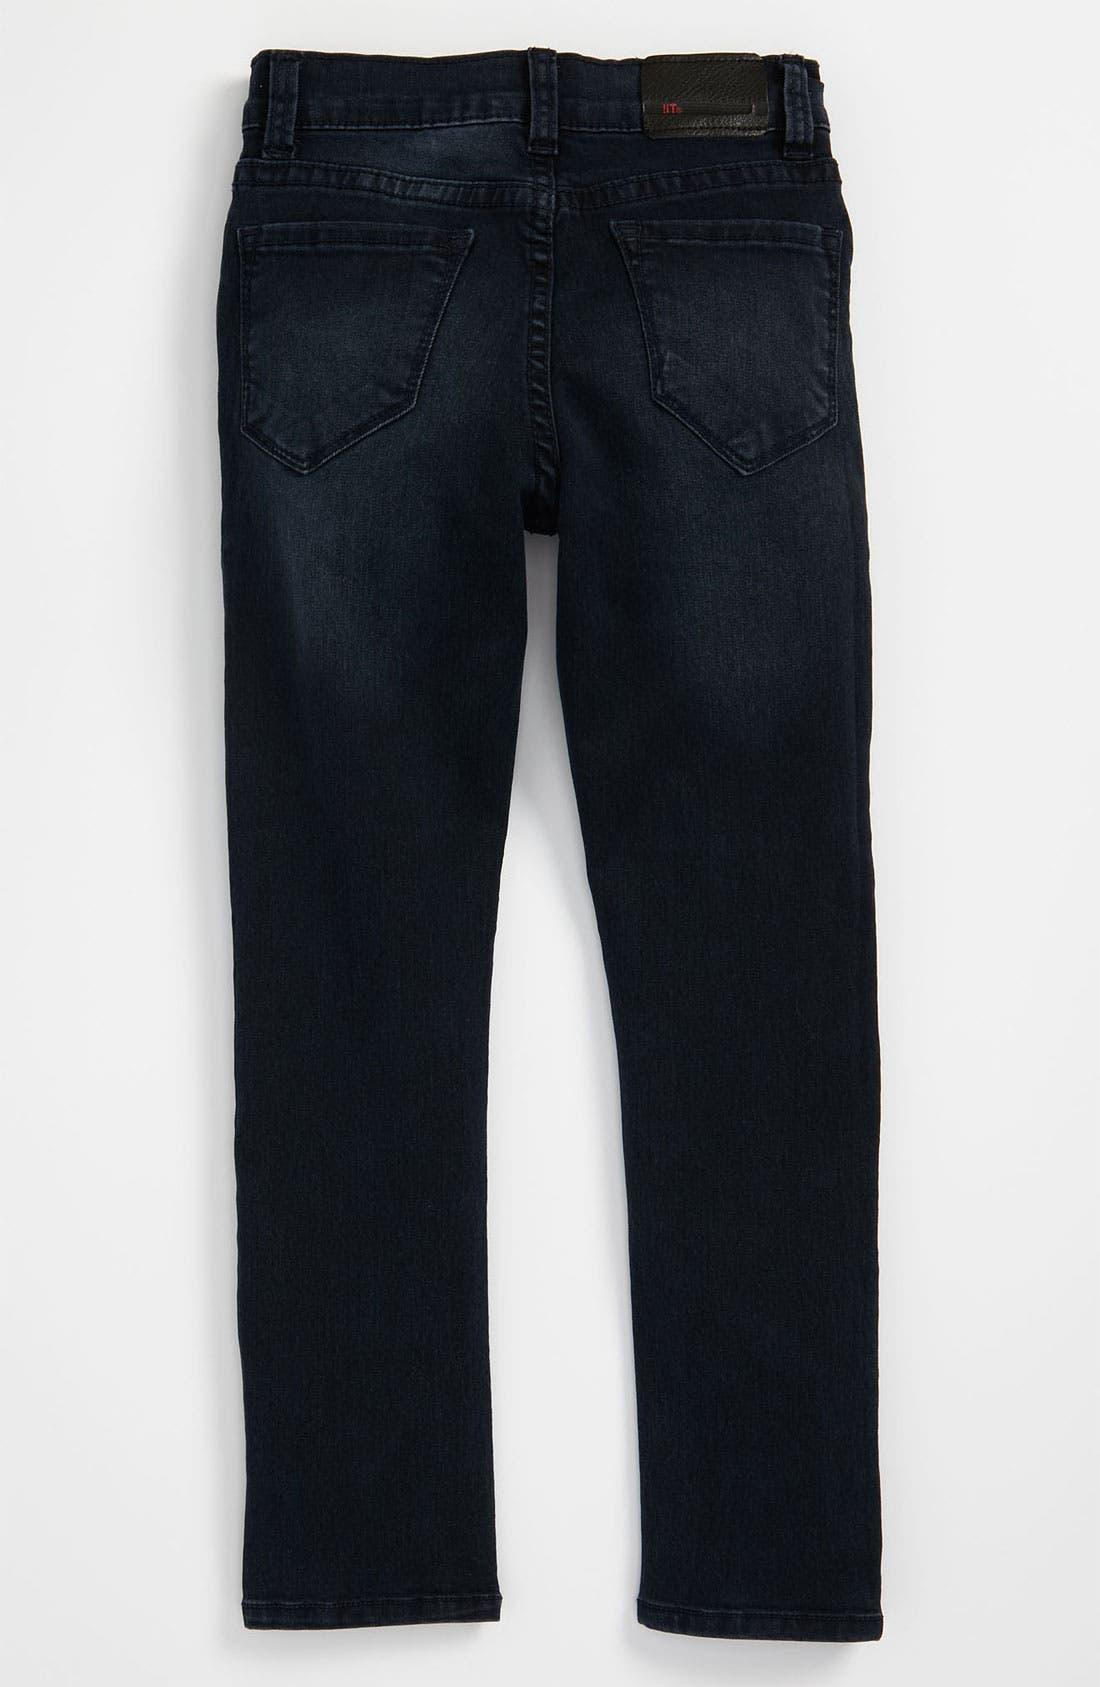 Alternate Image 1 Selected - !iT JEANS 'Starlett' Skinny Jeans (Big Girls)